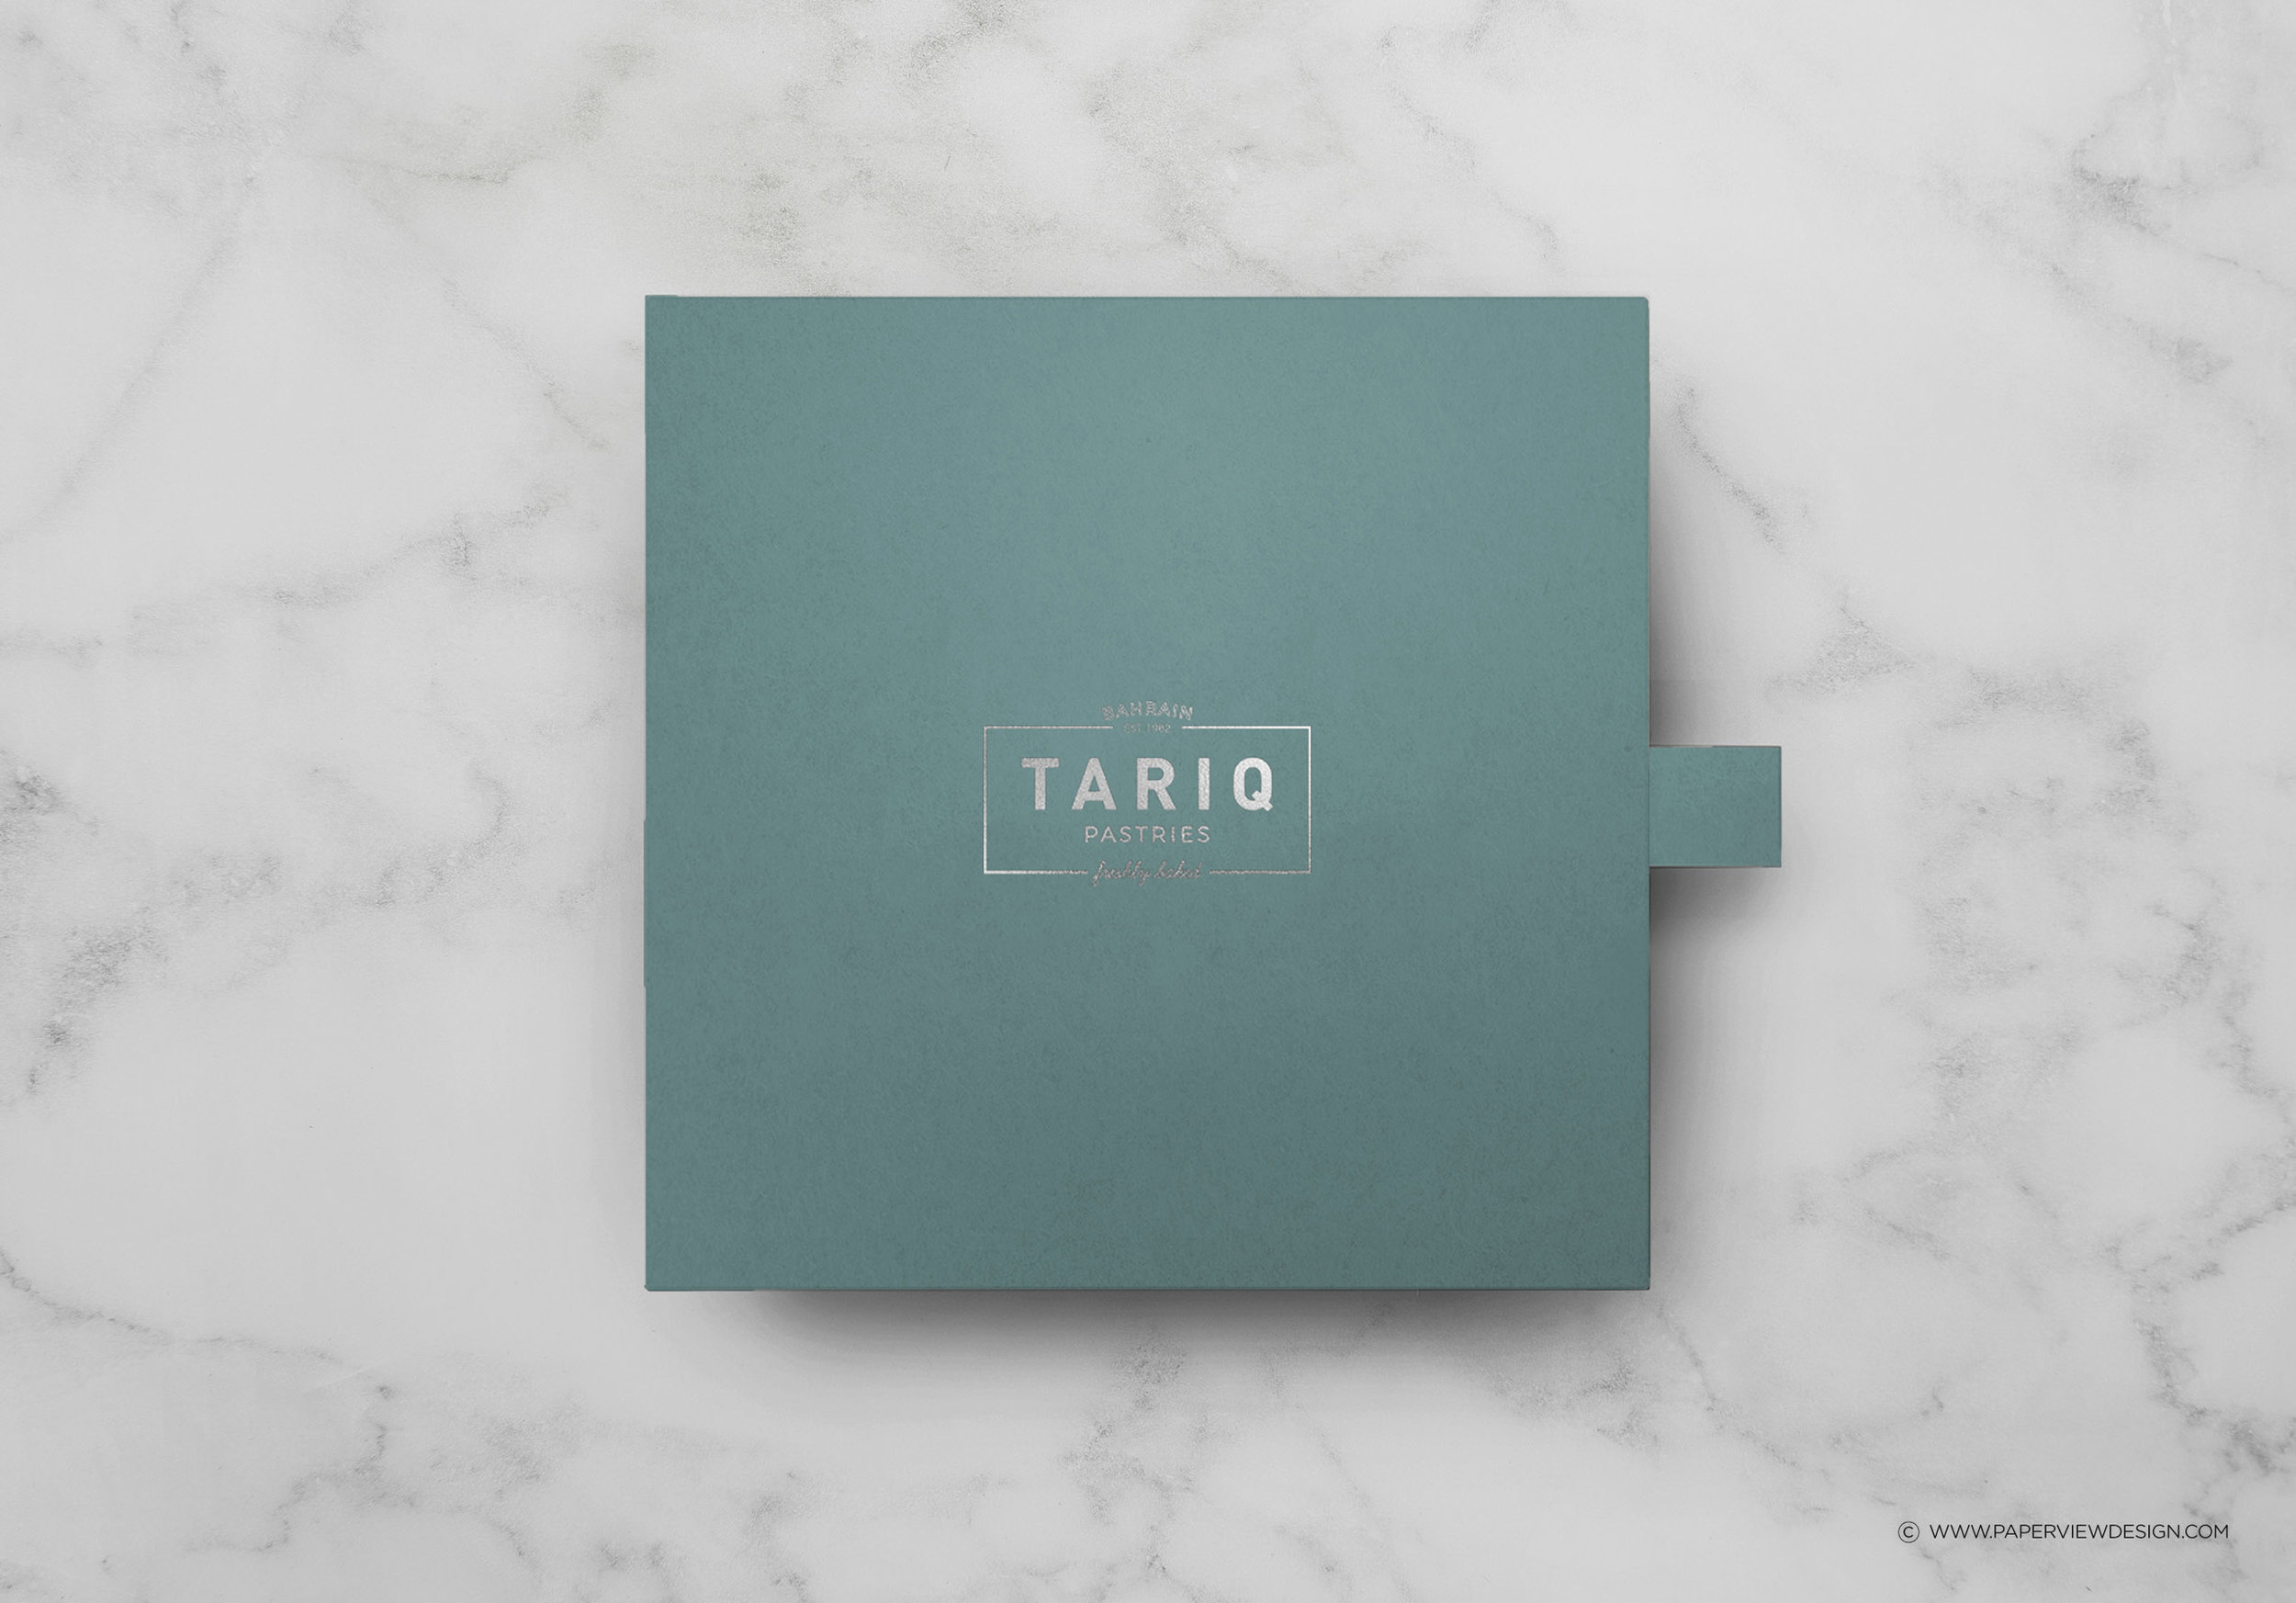 Tariq-Pastries-Box-Identity-Branding-Bahrain-Packaging